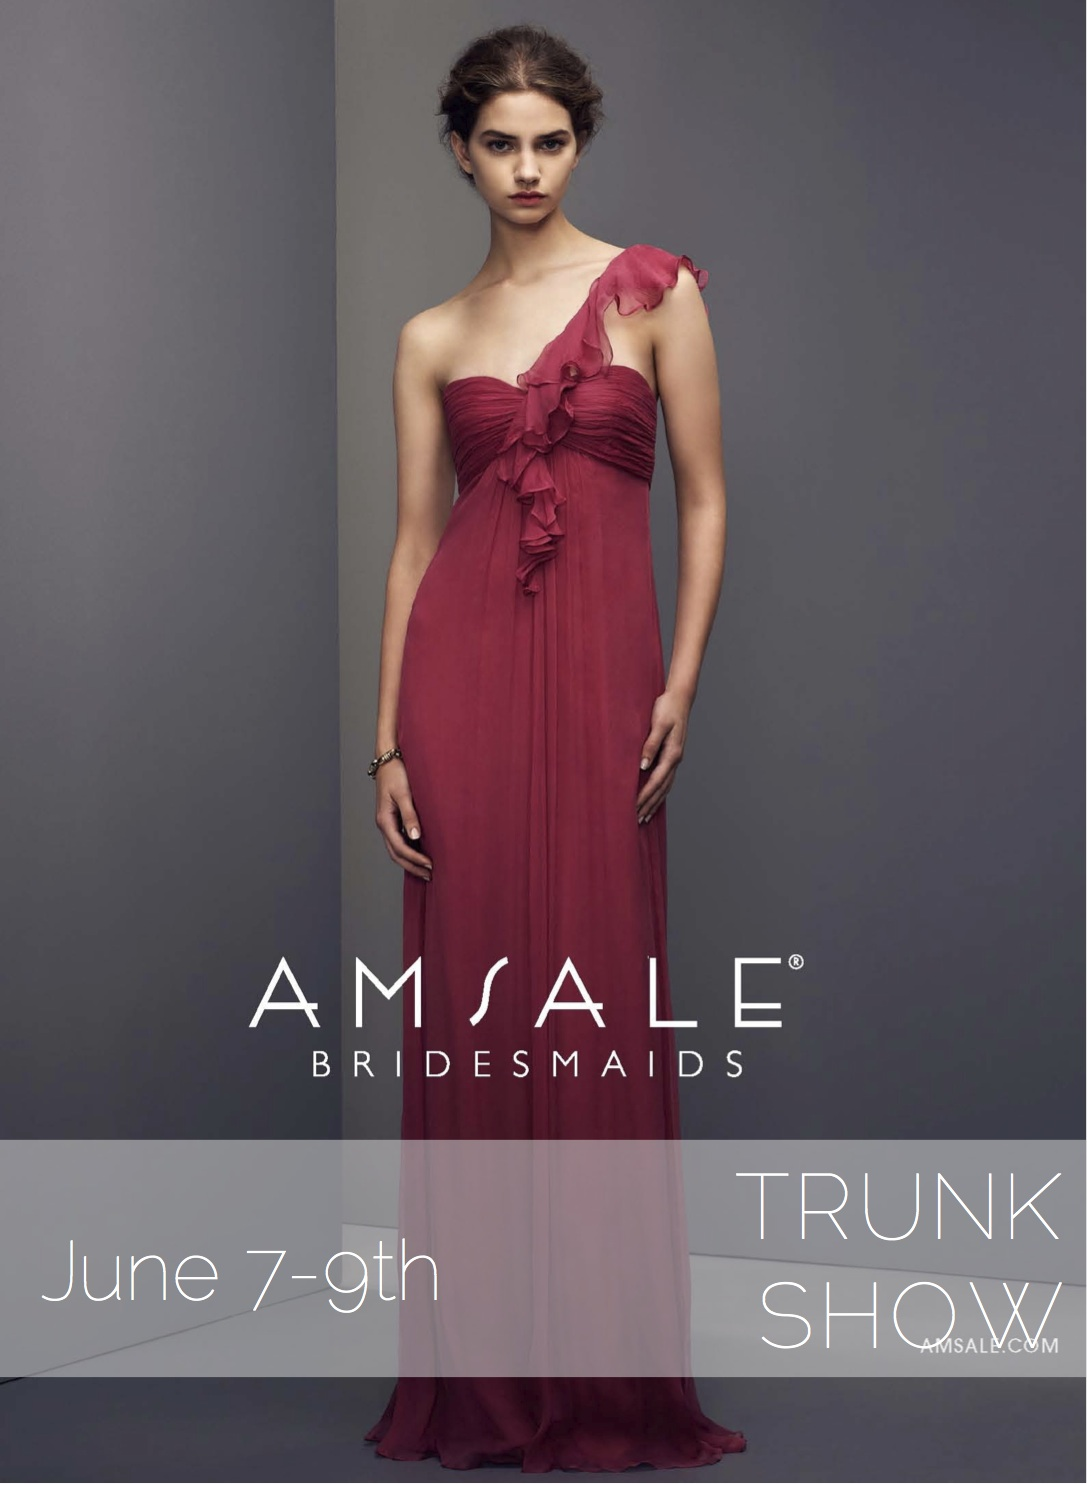 Amsale Bridesmaid Trunk Show